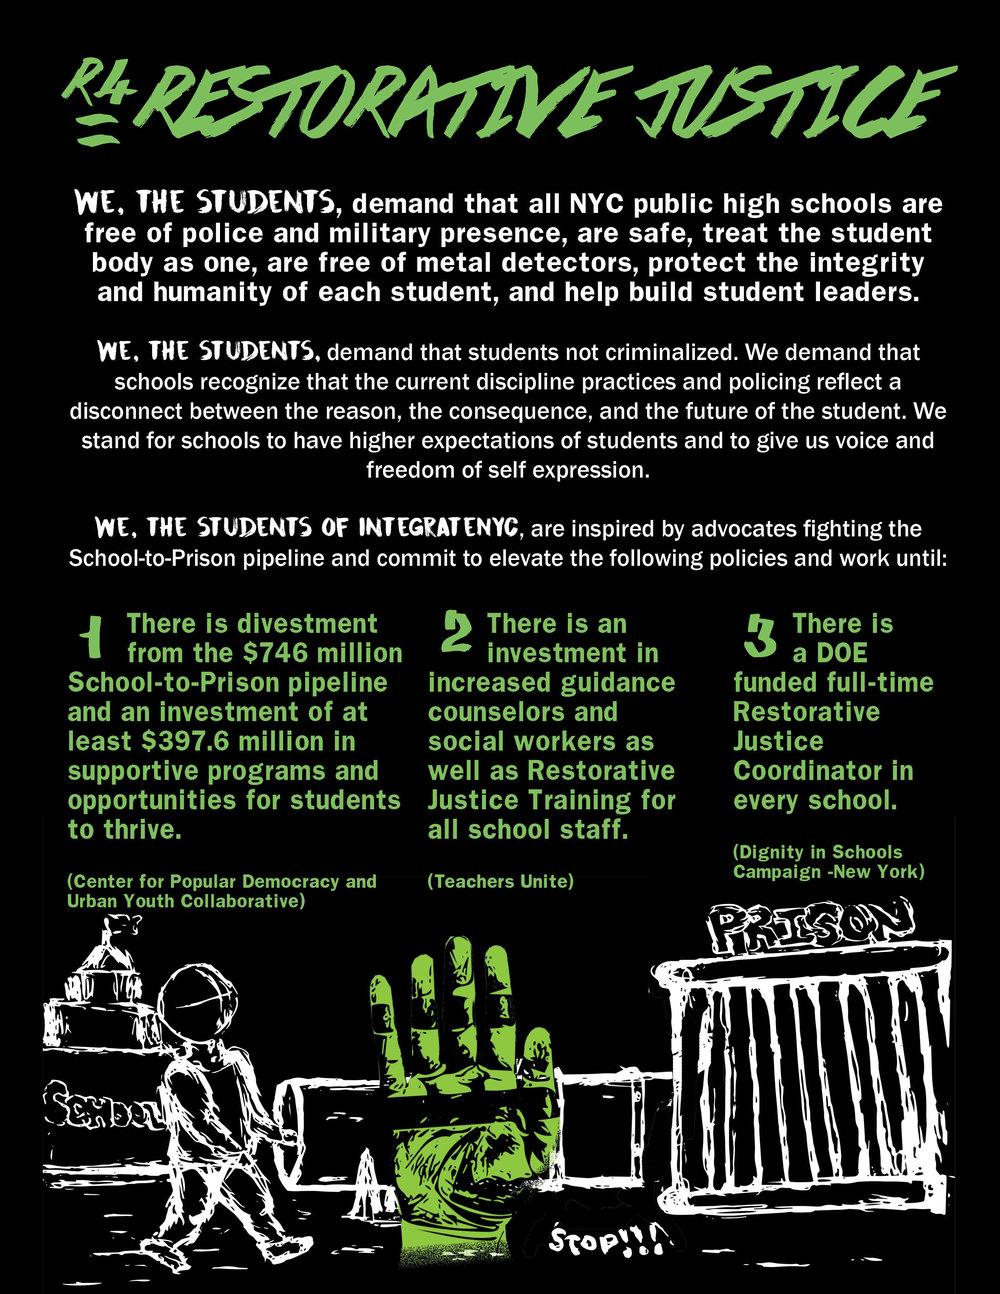 IntegrateNYC_Zine_Restorative Justice.jpg